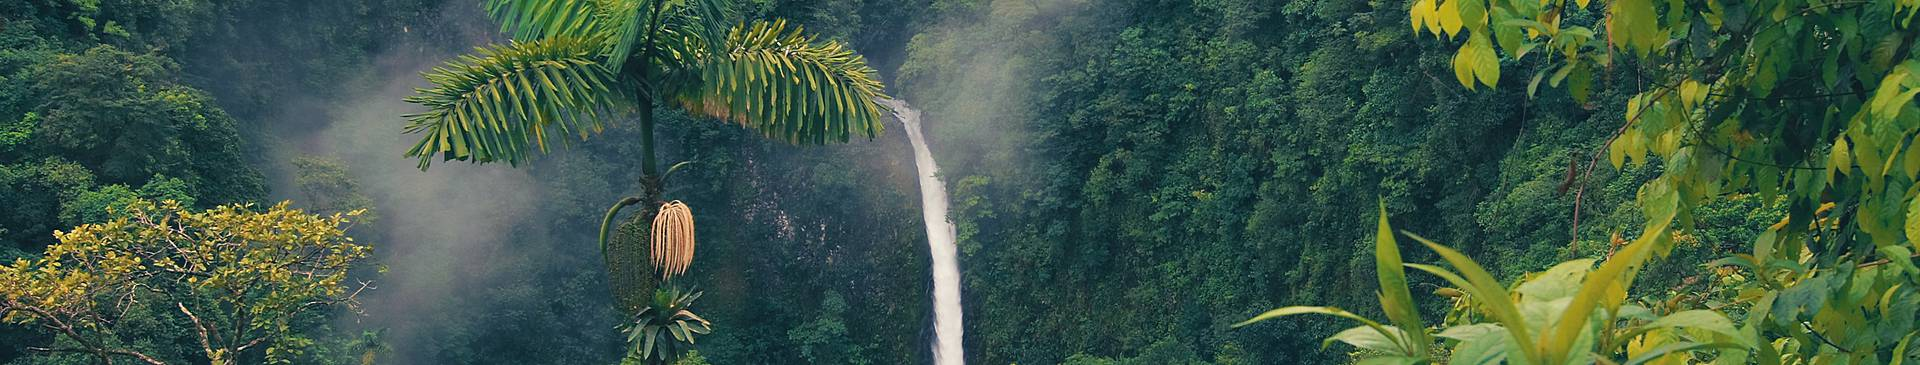 Rainforest tours in Costa Rica